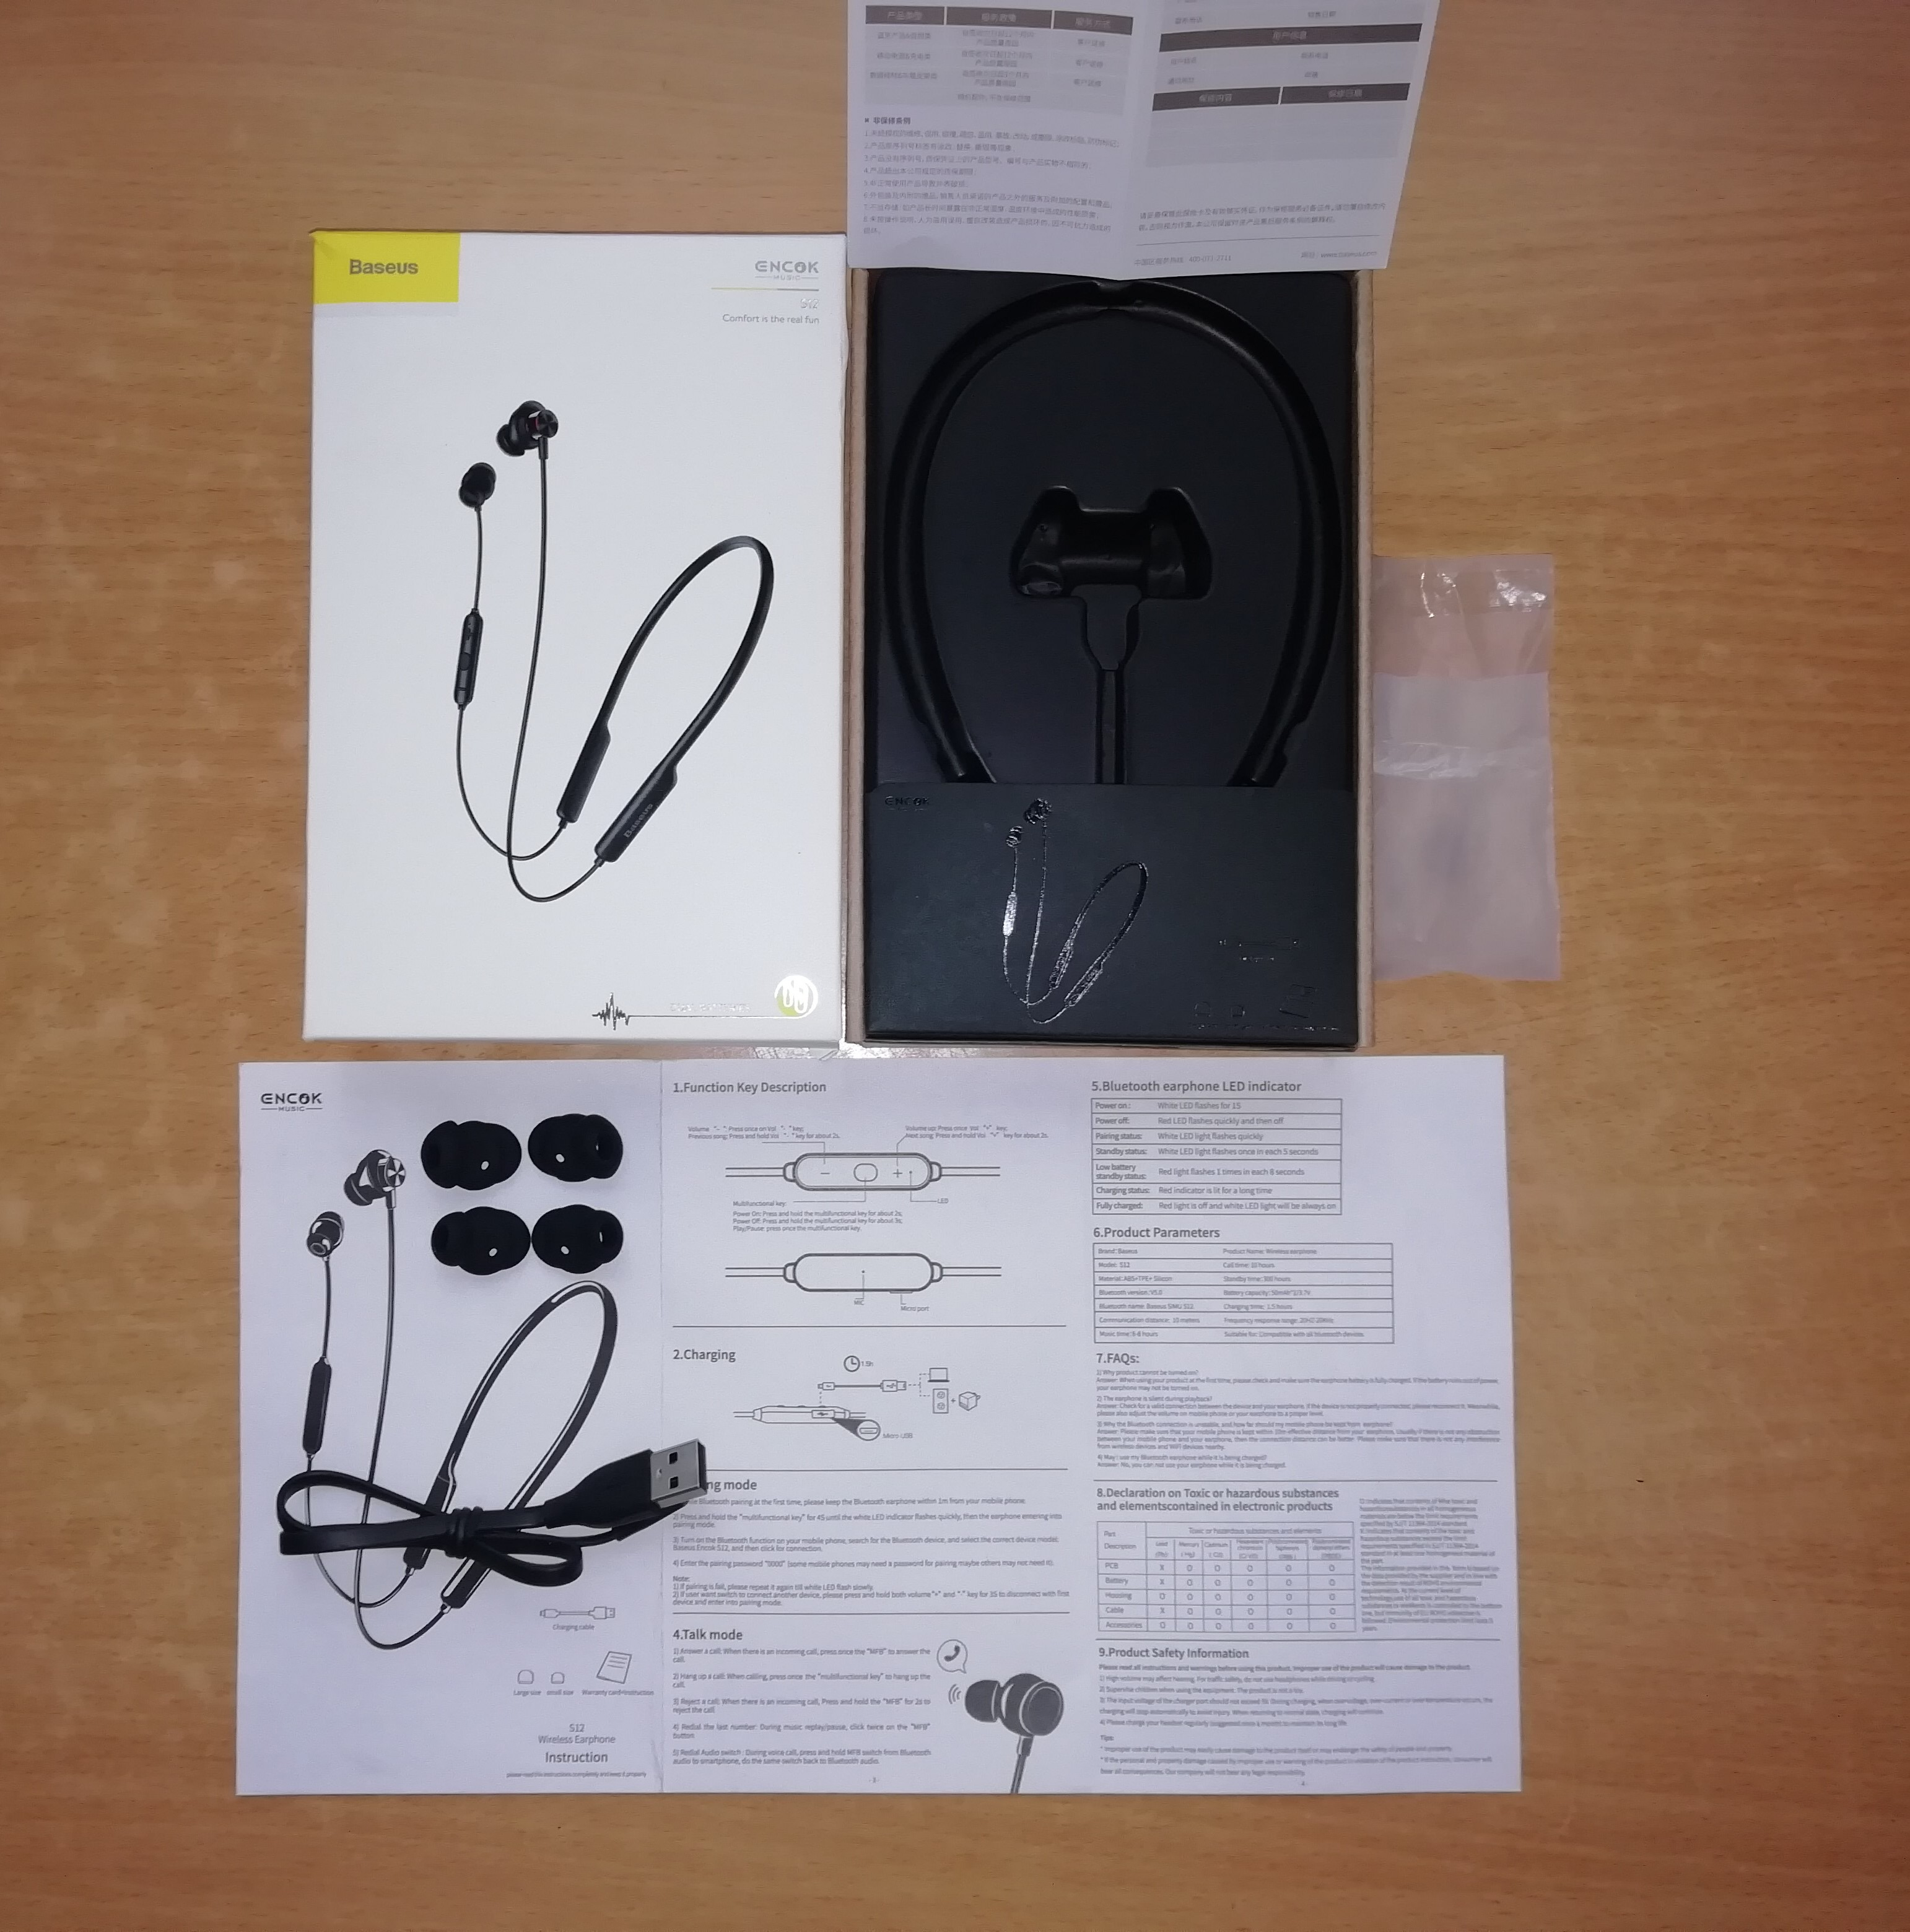 Baseus S12 Wireless Earphone For Phone iPhone Xiaomi Bluetooth 5.0 Headphone Handsfree Wireless Headset Earbud Earpiece With Mic|Bluetooth Earphones & Headphones| |  - AliExpress